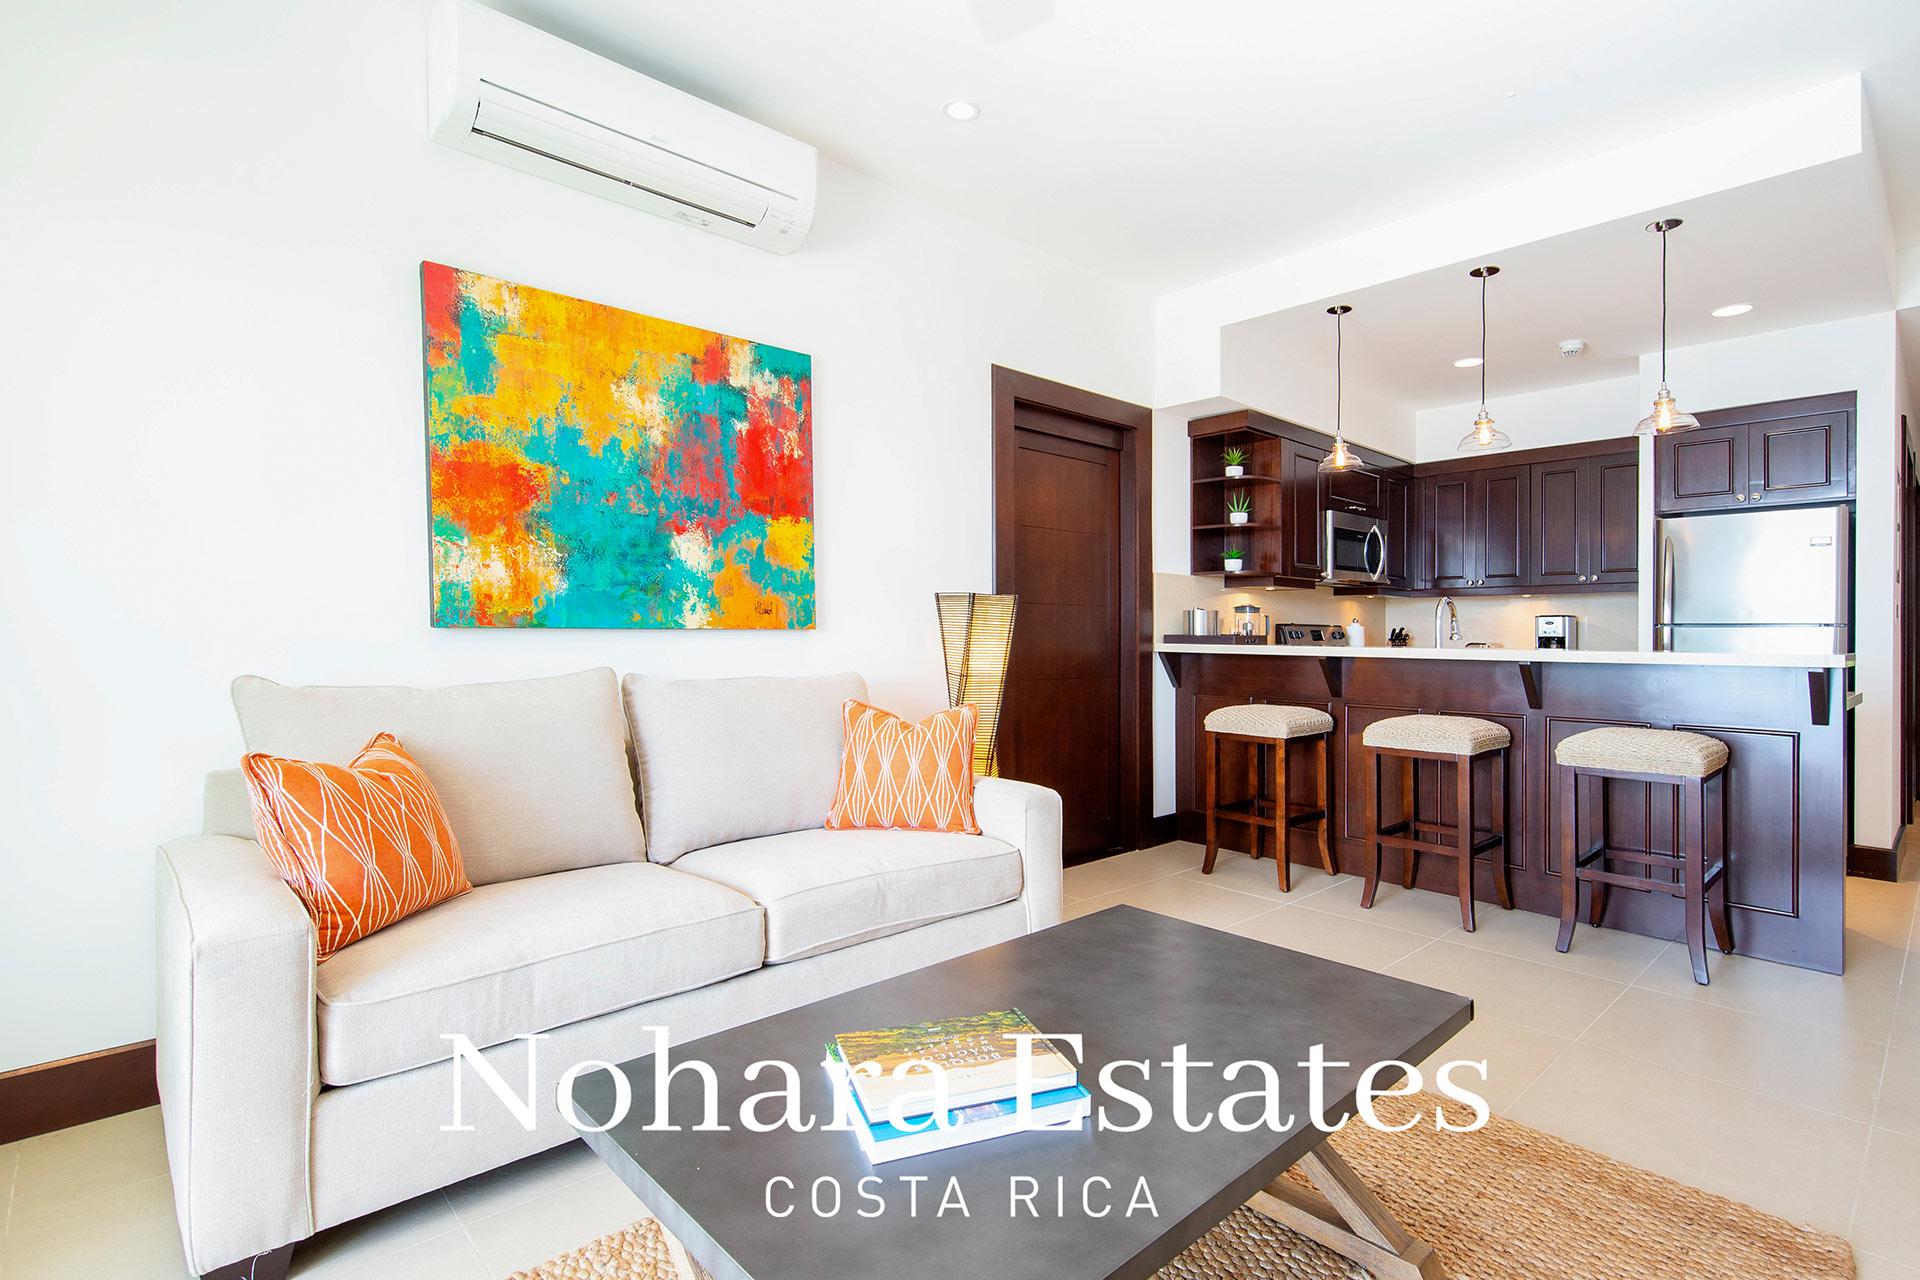 Nohara Estates Costa Rica Pacifico Playa Flamingo Pool Front Apartment 3